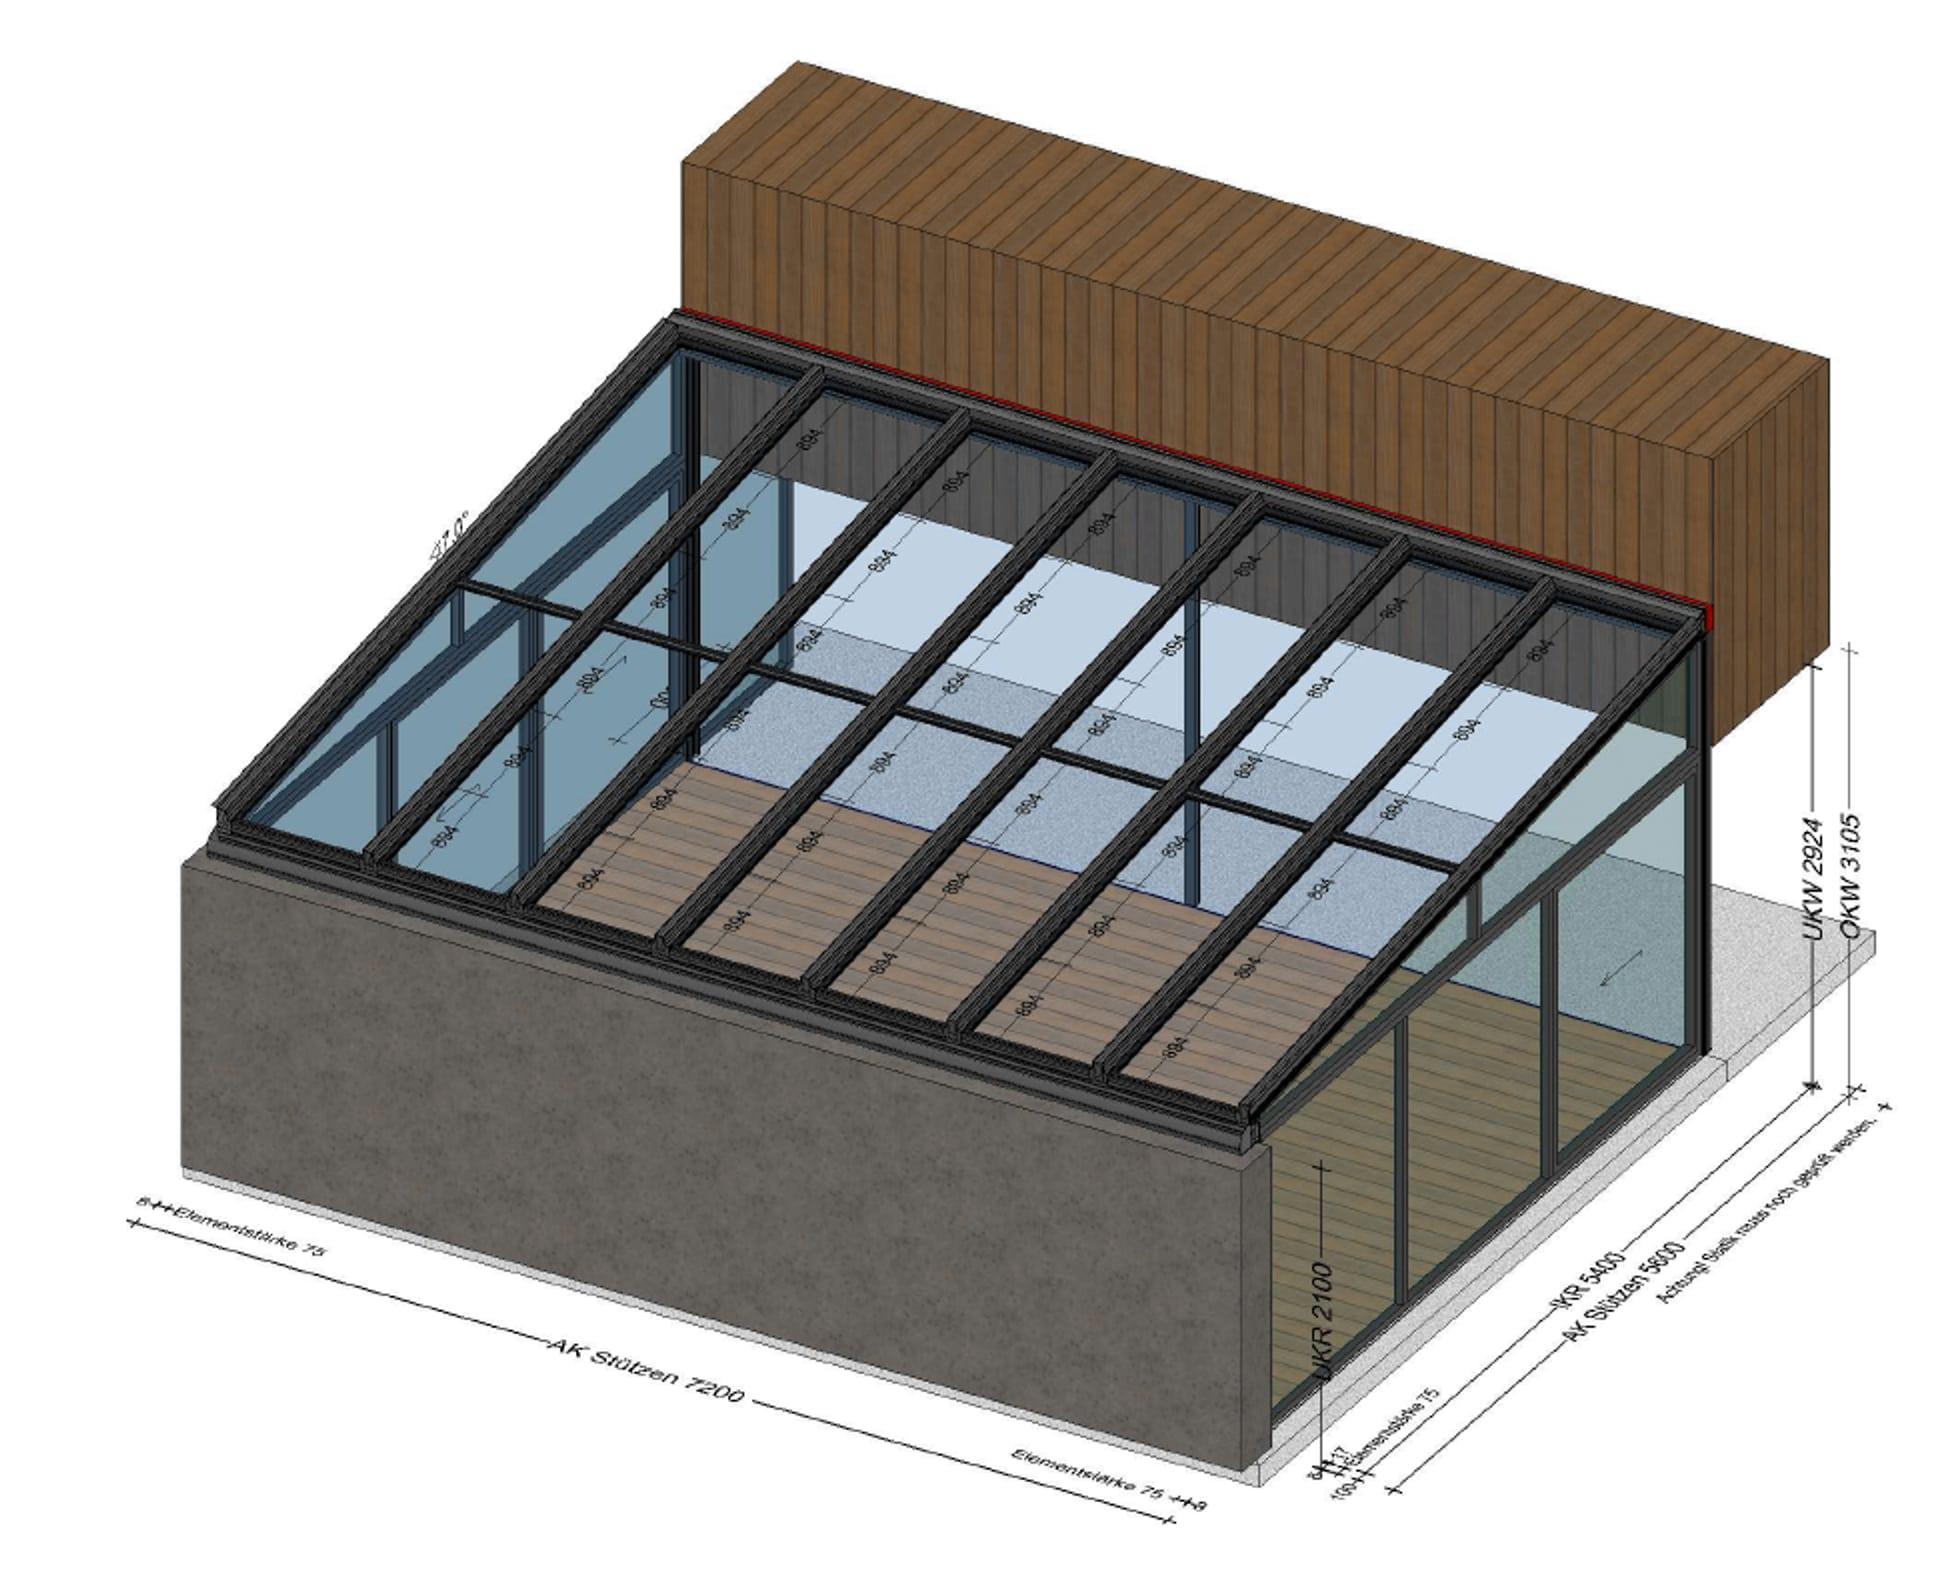 Beheizter Wintergarten für Indoor-Pool